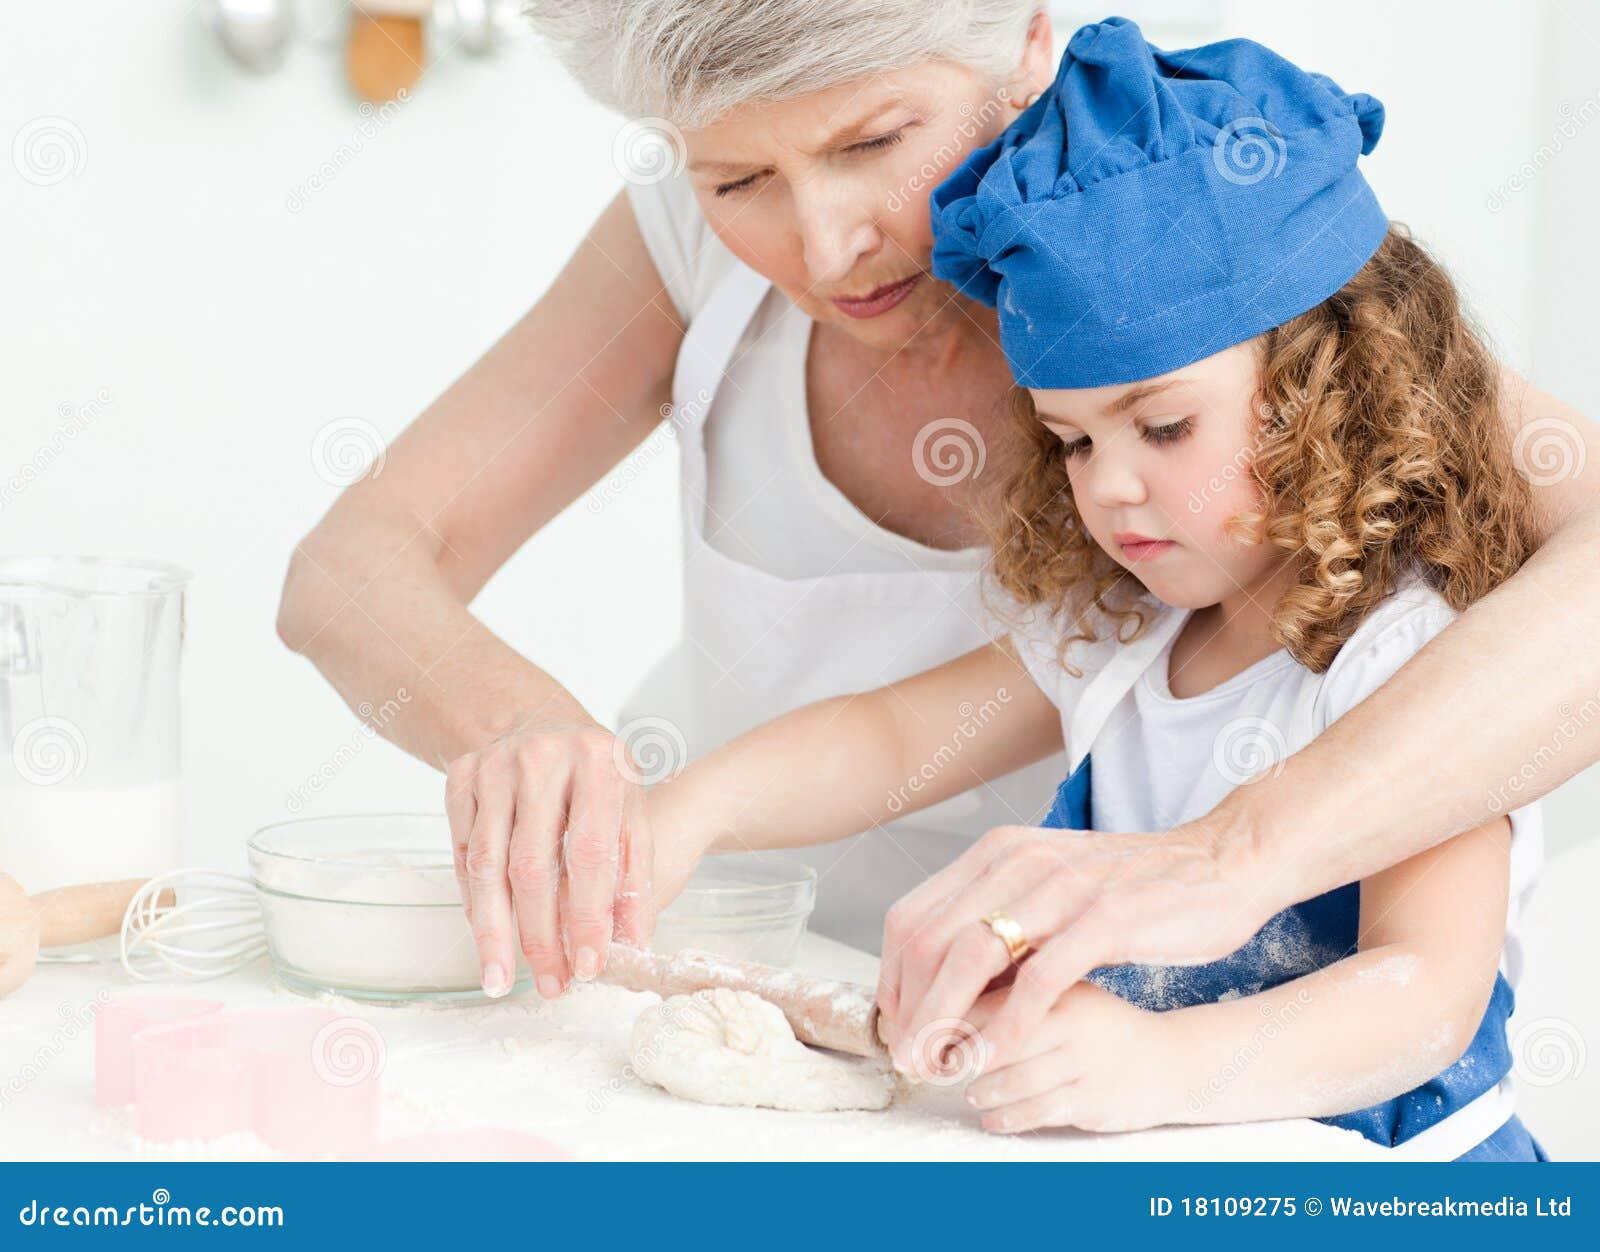 С бабушкой на кухне 15 фотография